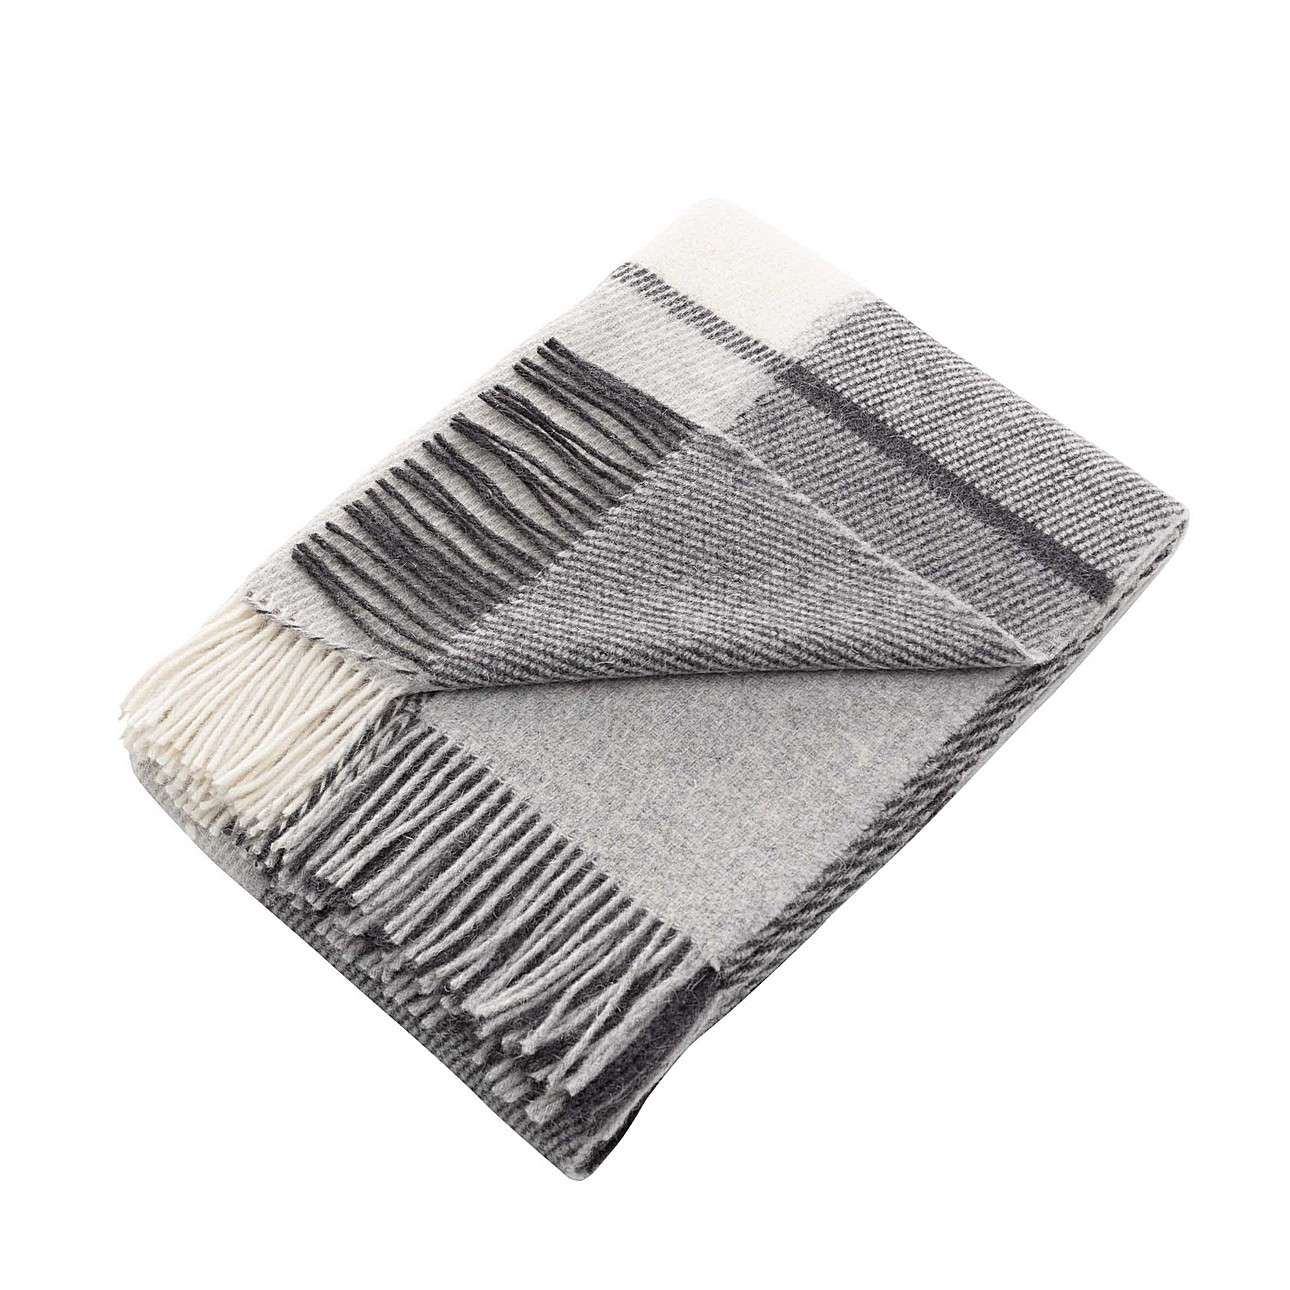 Pled Zelandia 140x200cm grey check